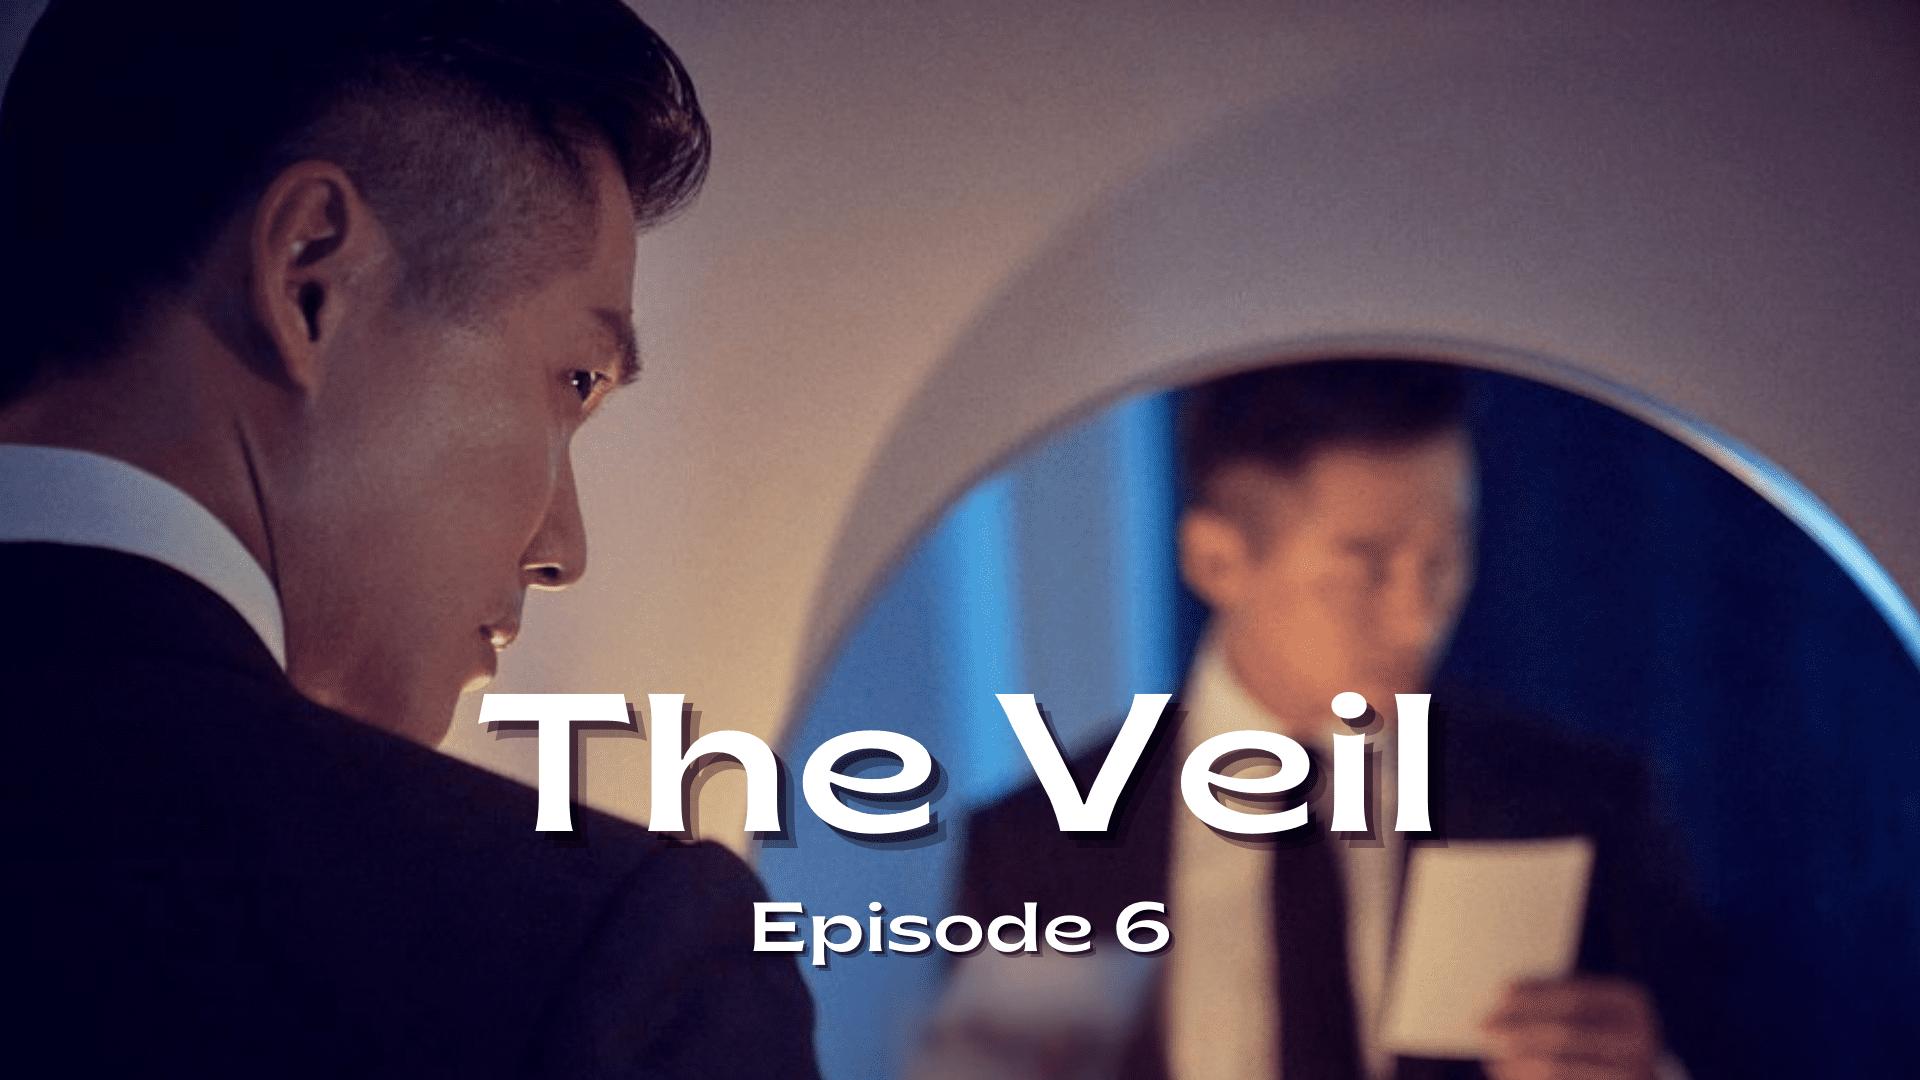 The Veil Episode 6